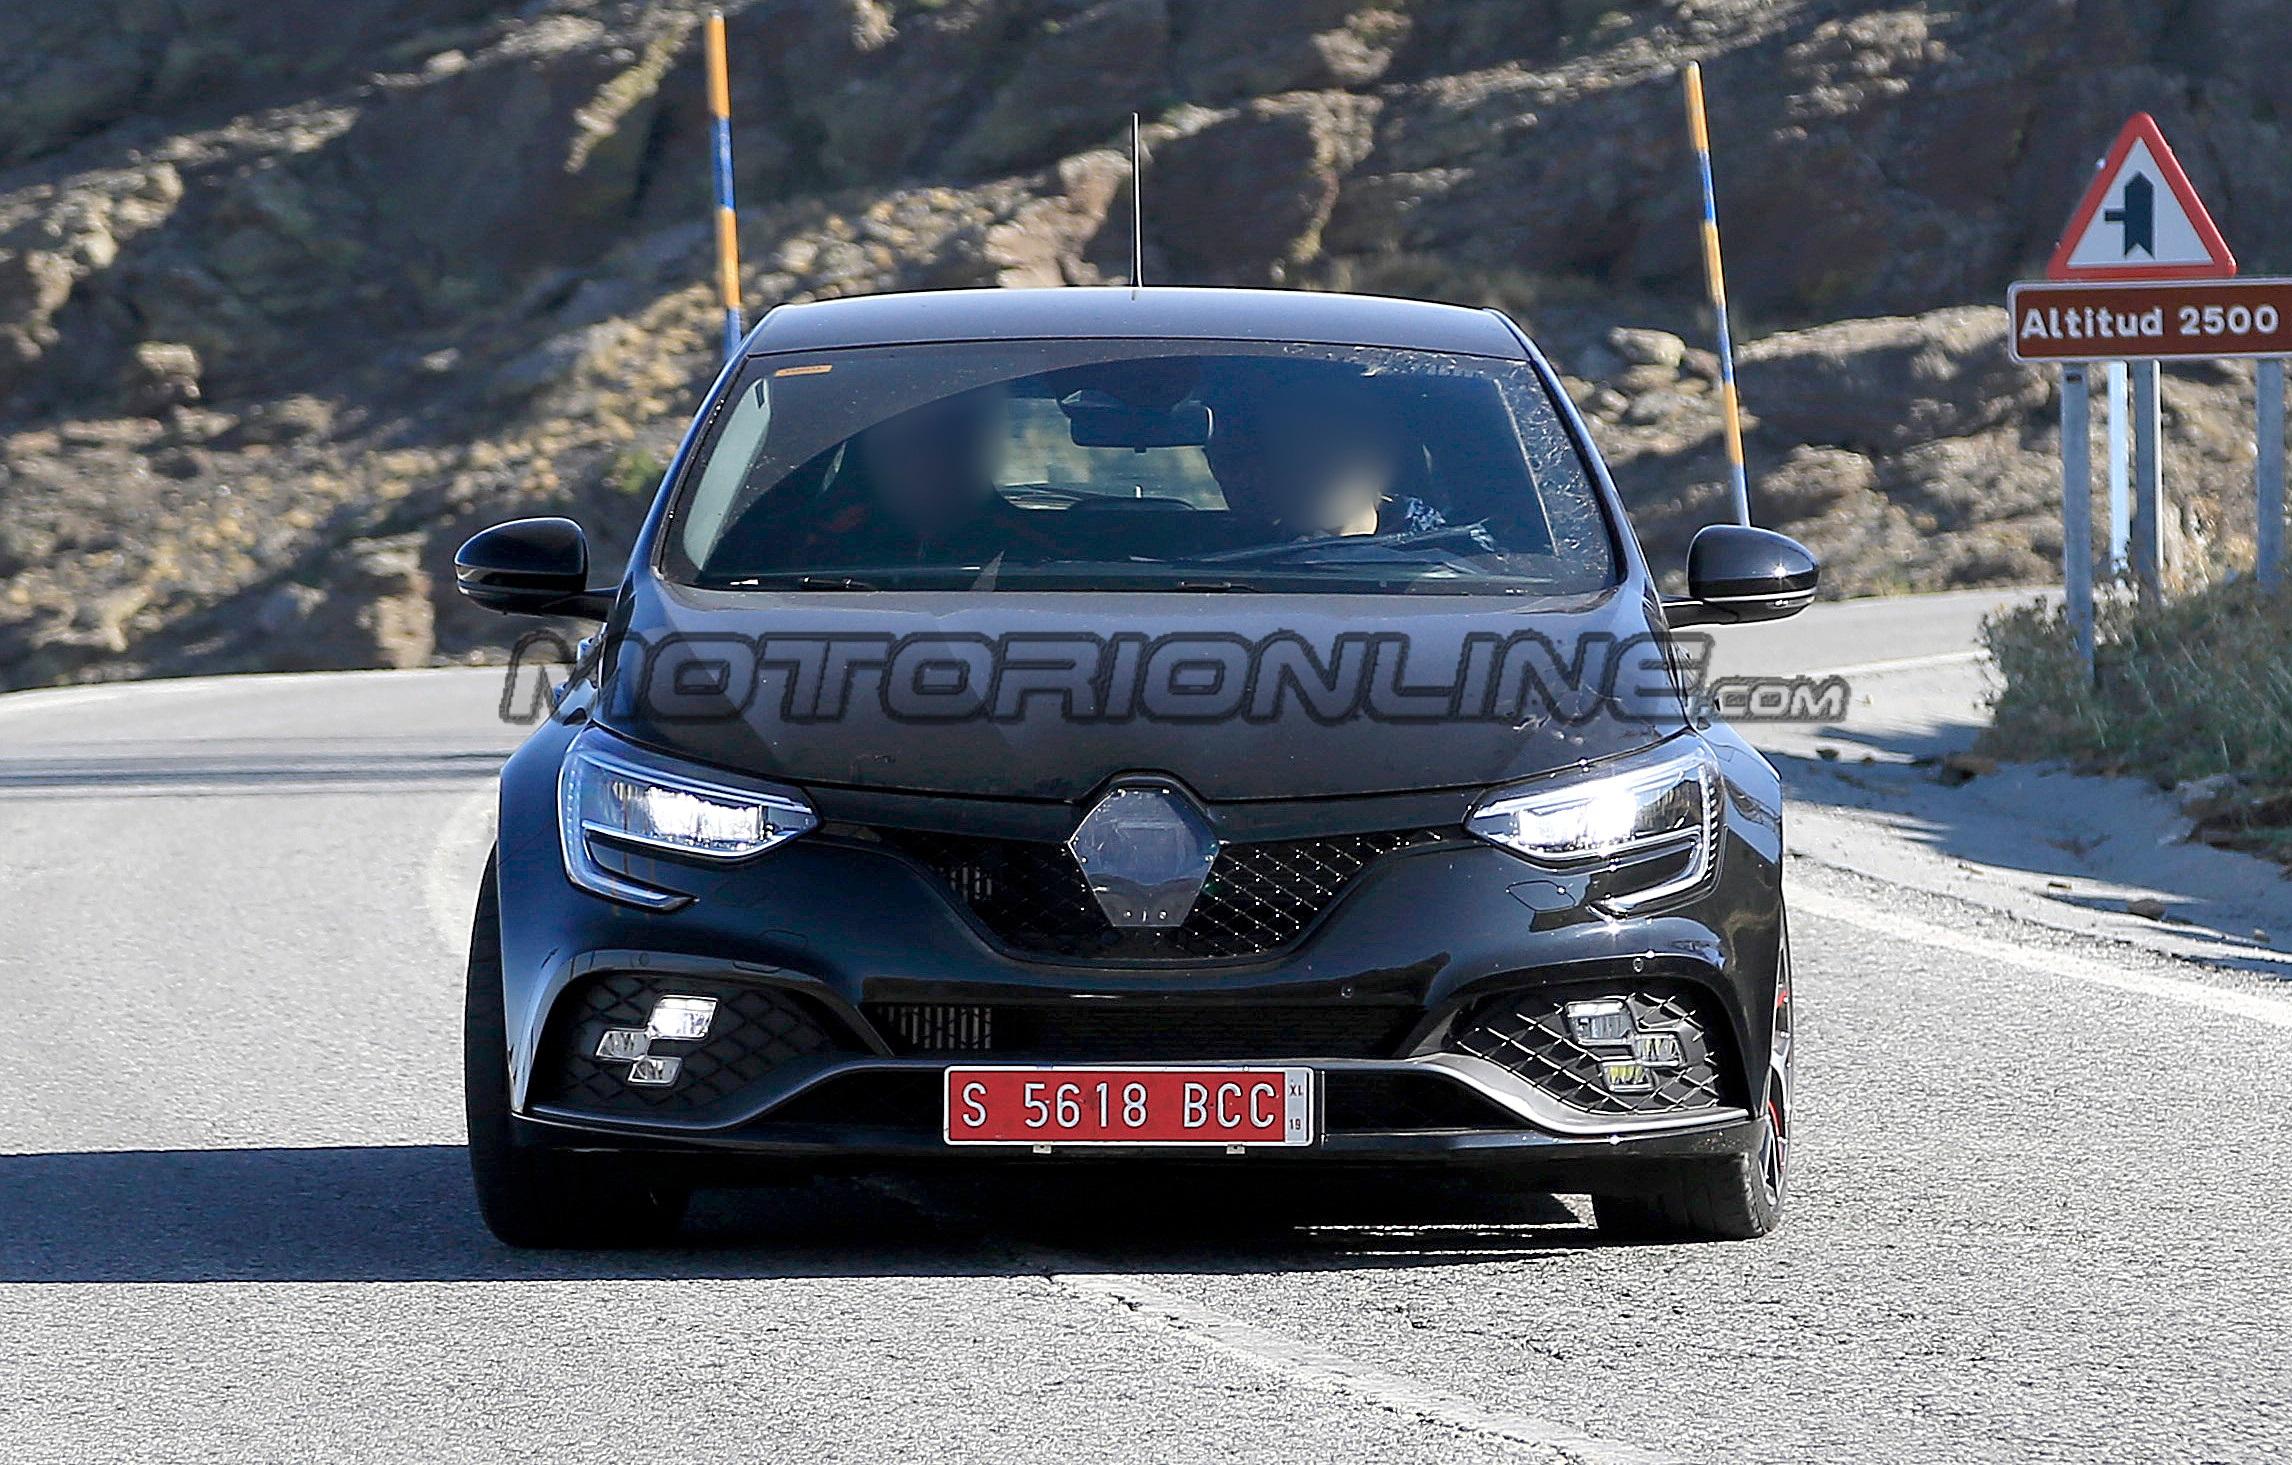 Renault Megane RS 2020 - Foto spia 05-09-2019